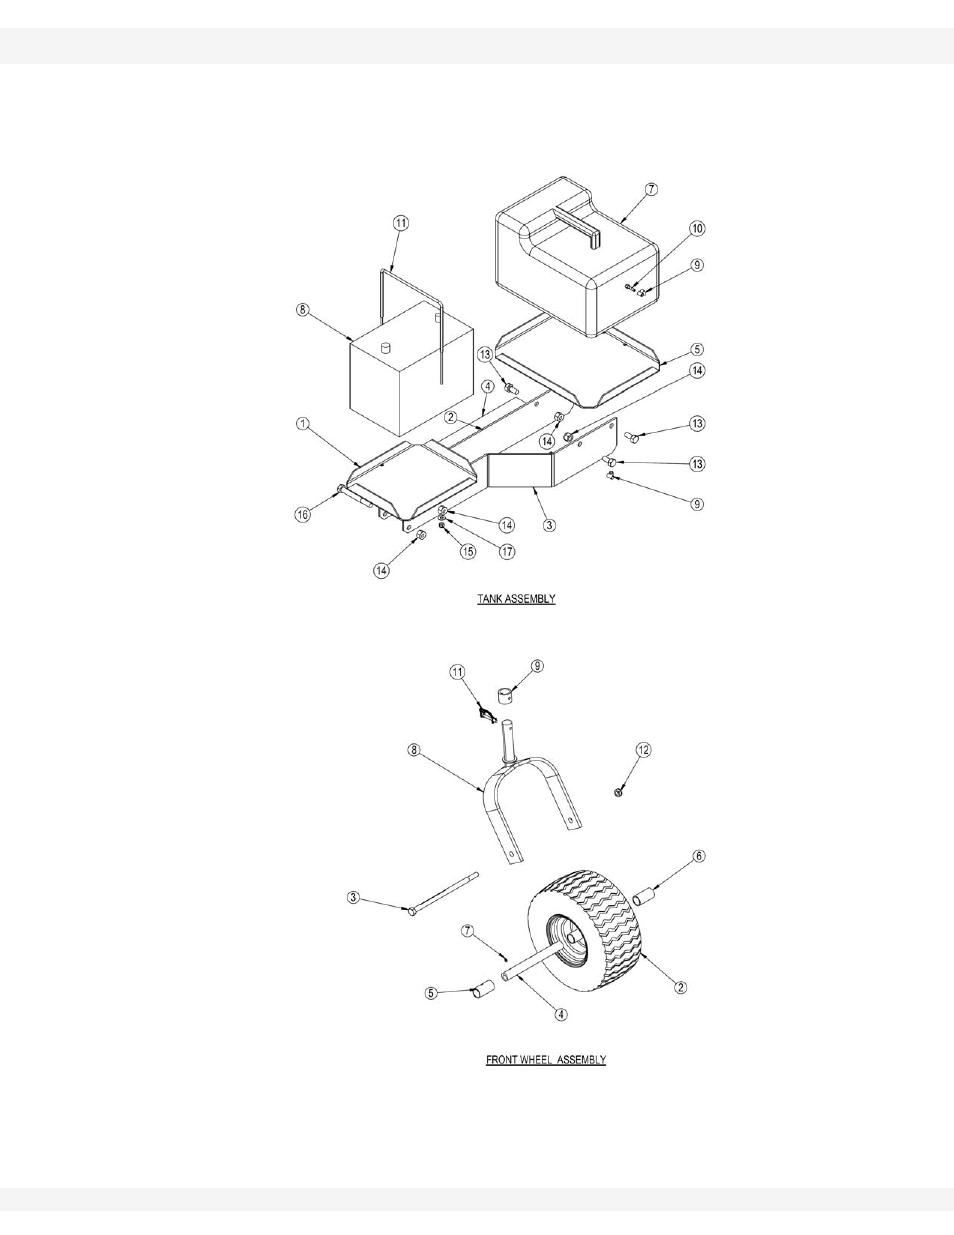 Wheatheart Self-Propelled Post Pounder Kit User Manual